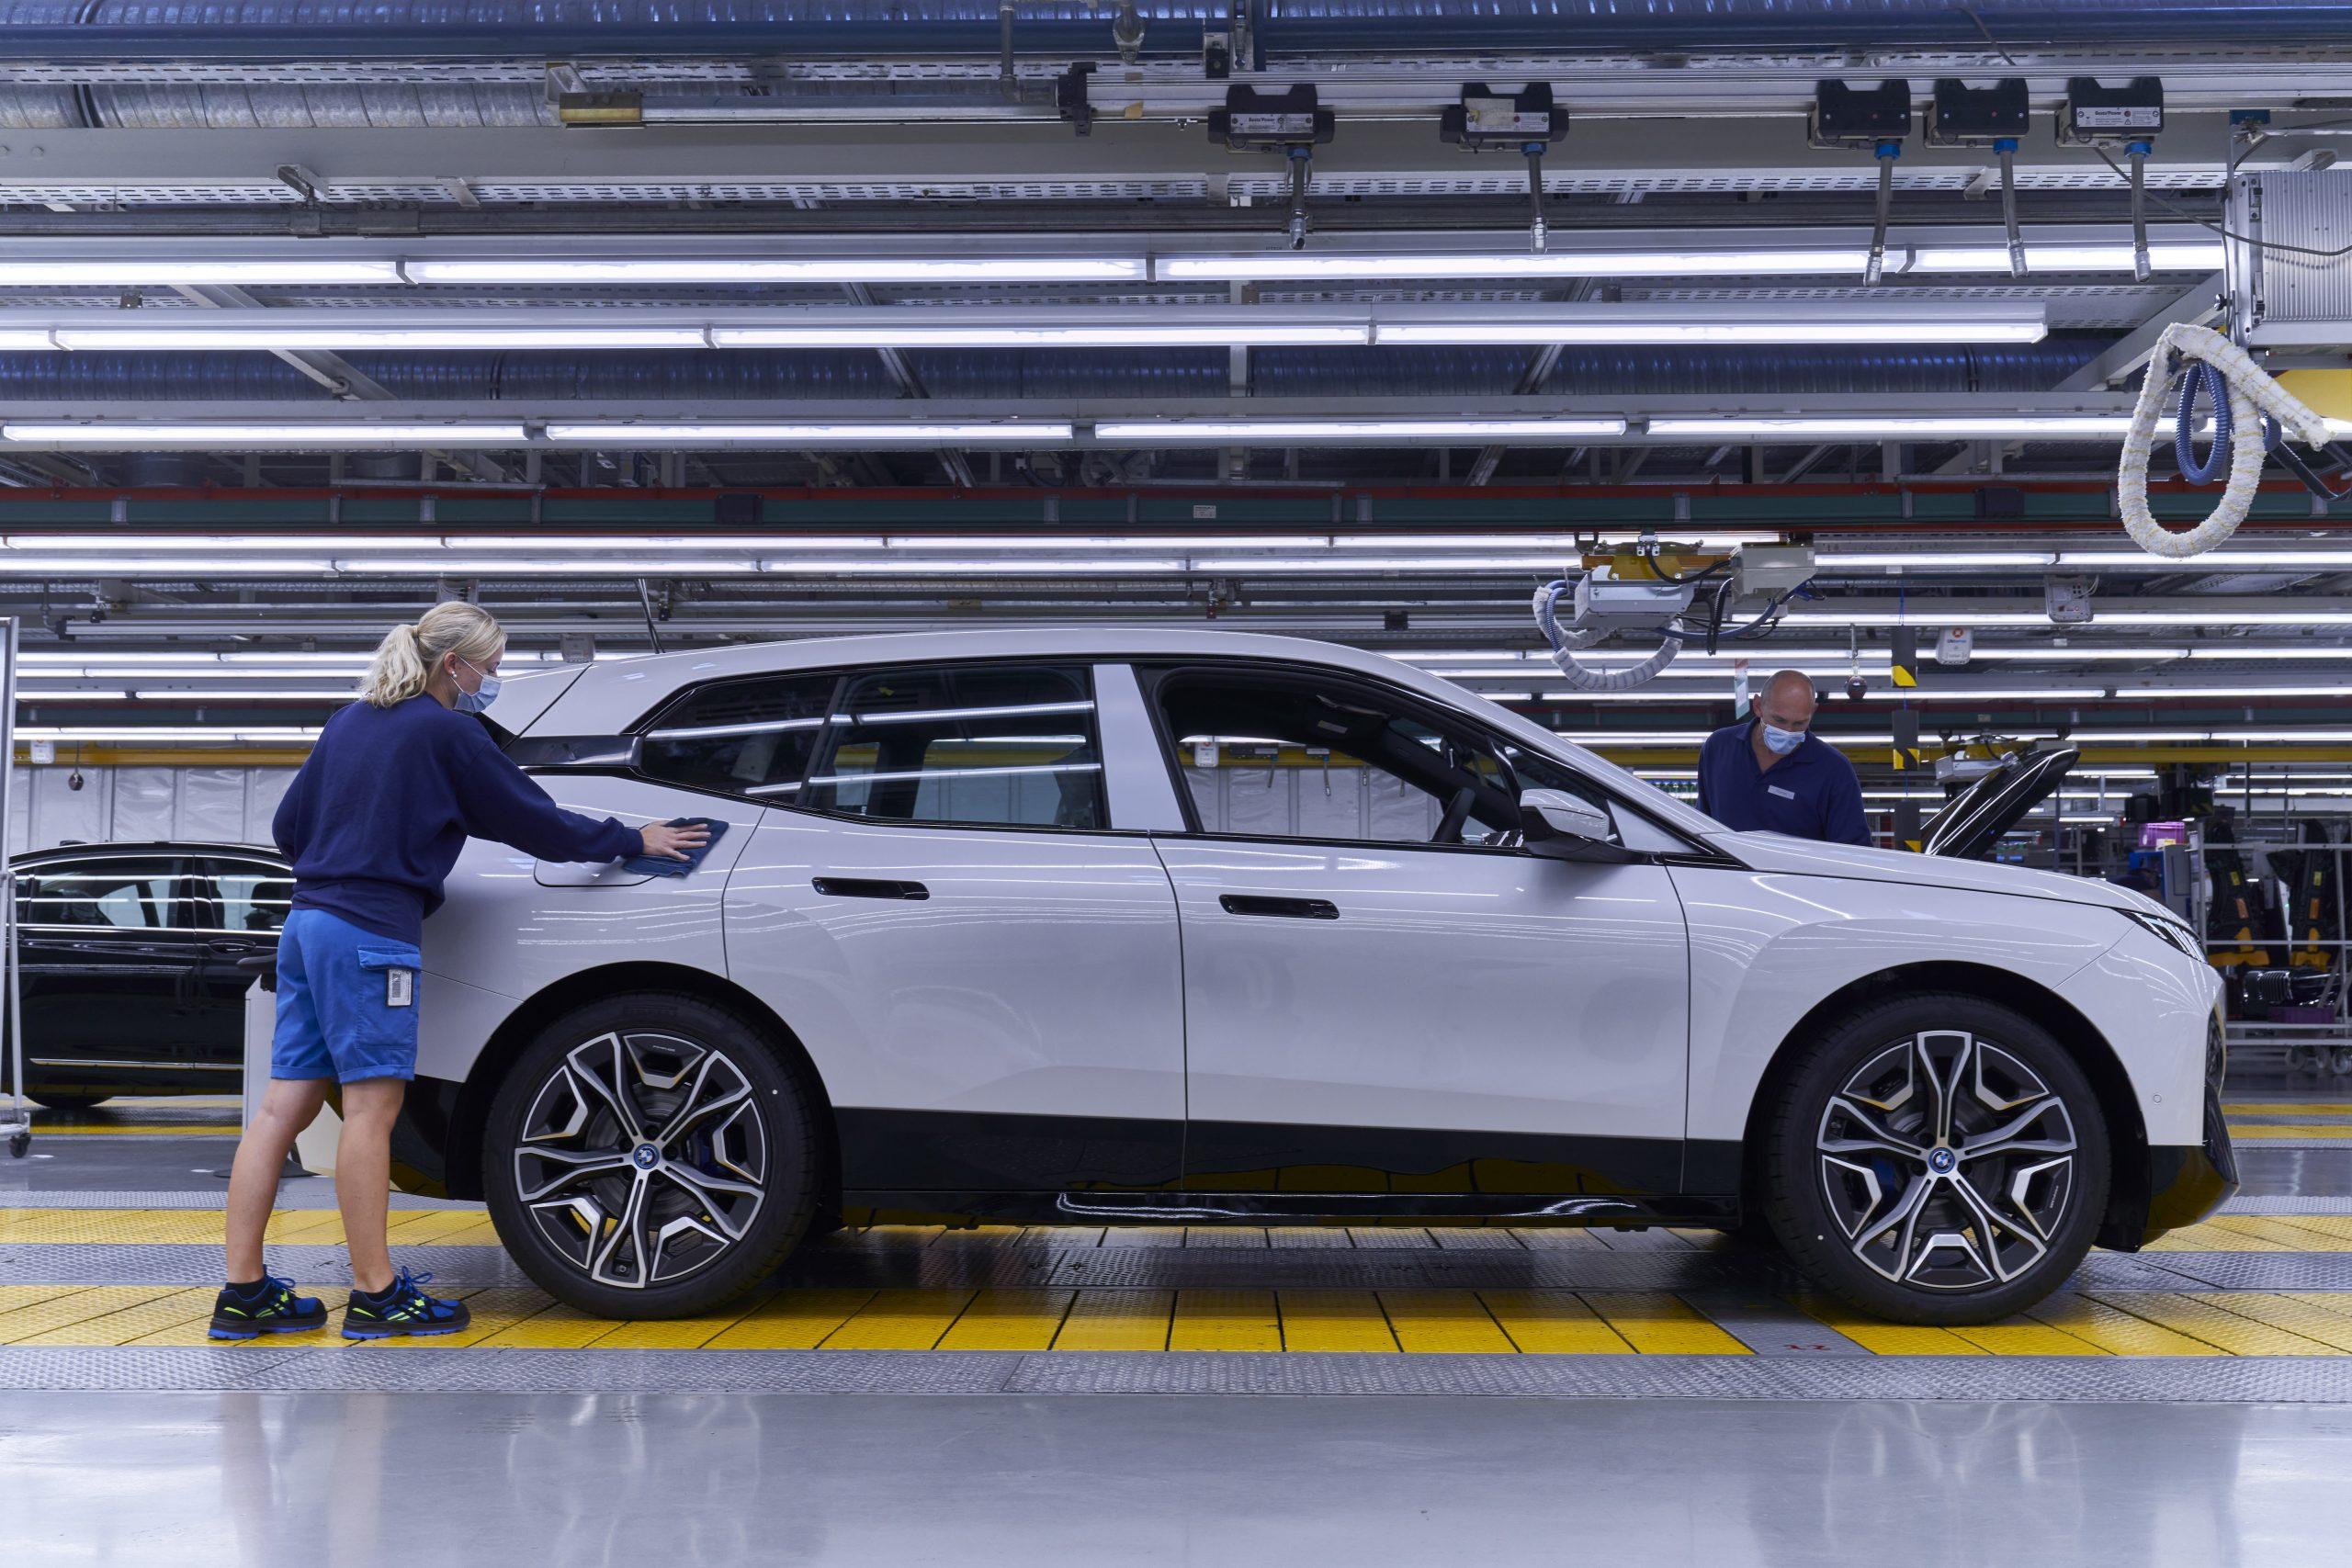 P90407628 highRes scaled Οι πρώτες BMW iX βγαίνουν από τη γραμμή παραγωγής BMW, BMW i, BMW iX, Electric cars, electric vehicles, ειδήσεις, ηλεκτρικά, ηλεκτροκινηση, Νέα